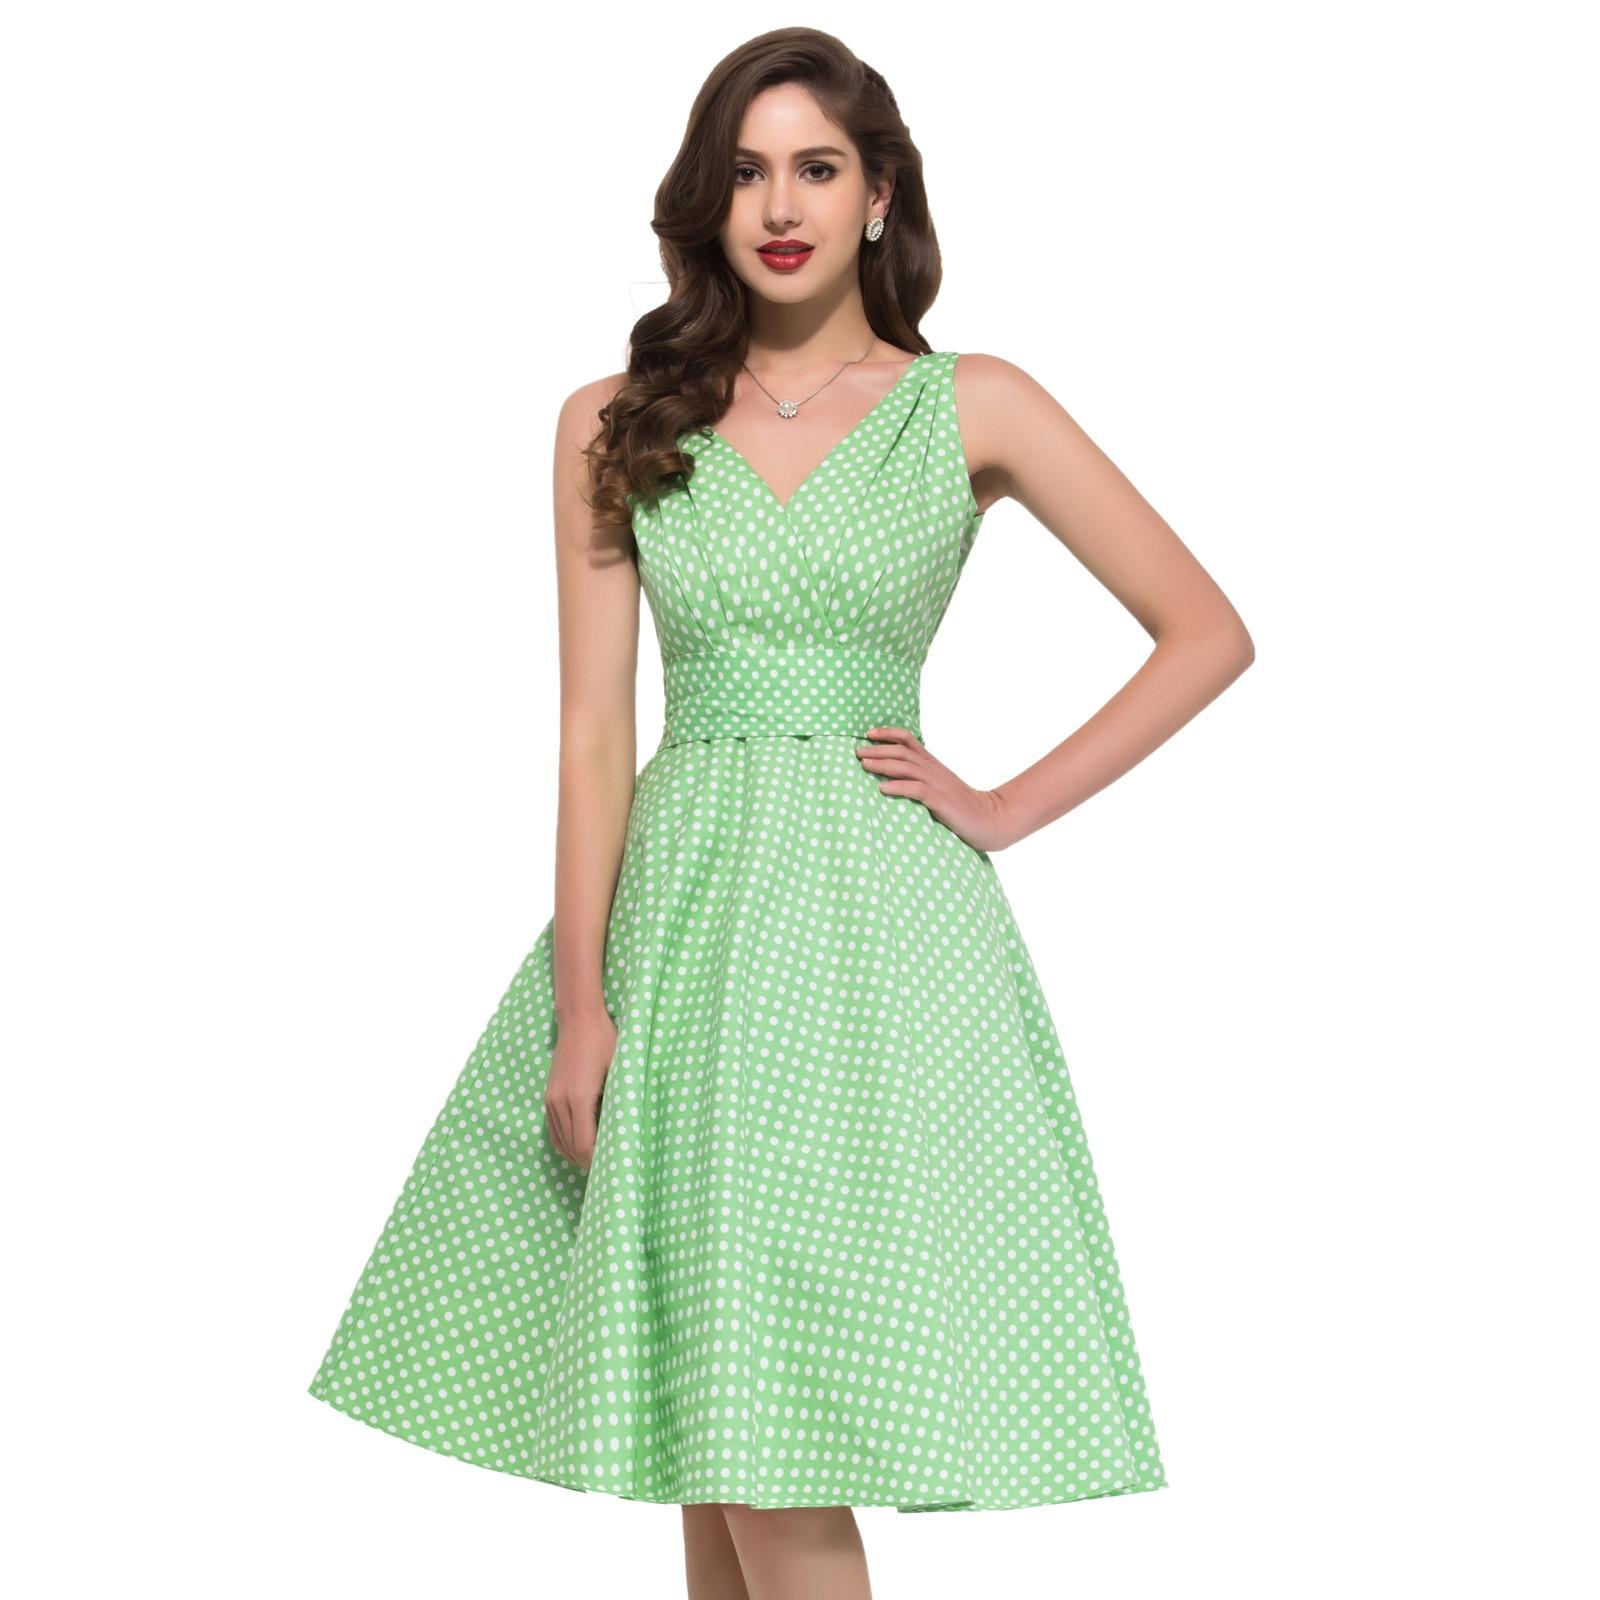 Polka Dot Dress Grace Karin Vintage Rockabilly Dresses 2018 Summer Audrey Hepburn Vestidos Party 50s Dresses Vestidos Female